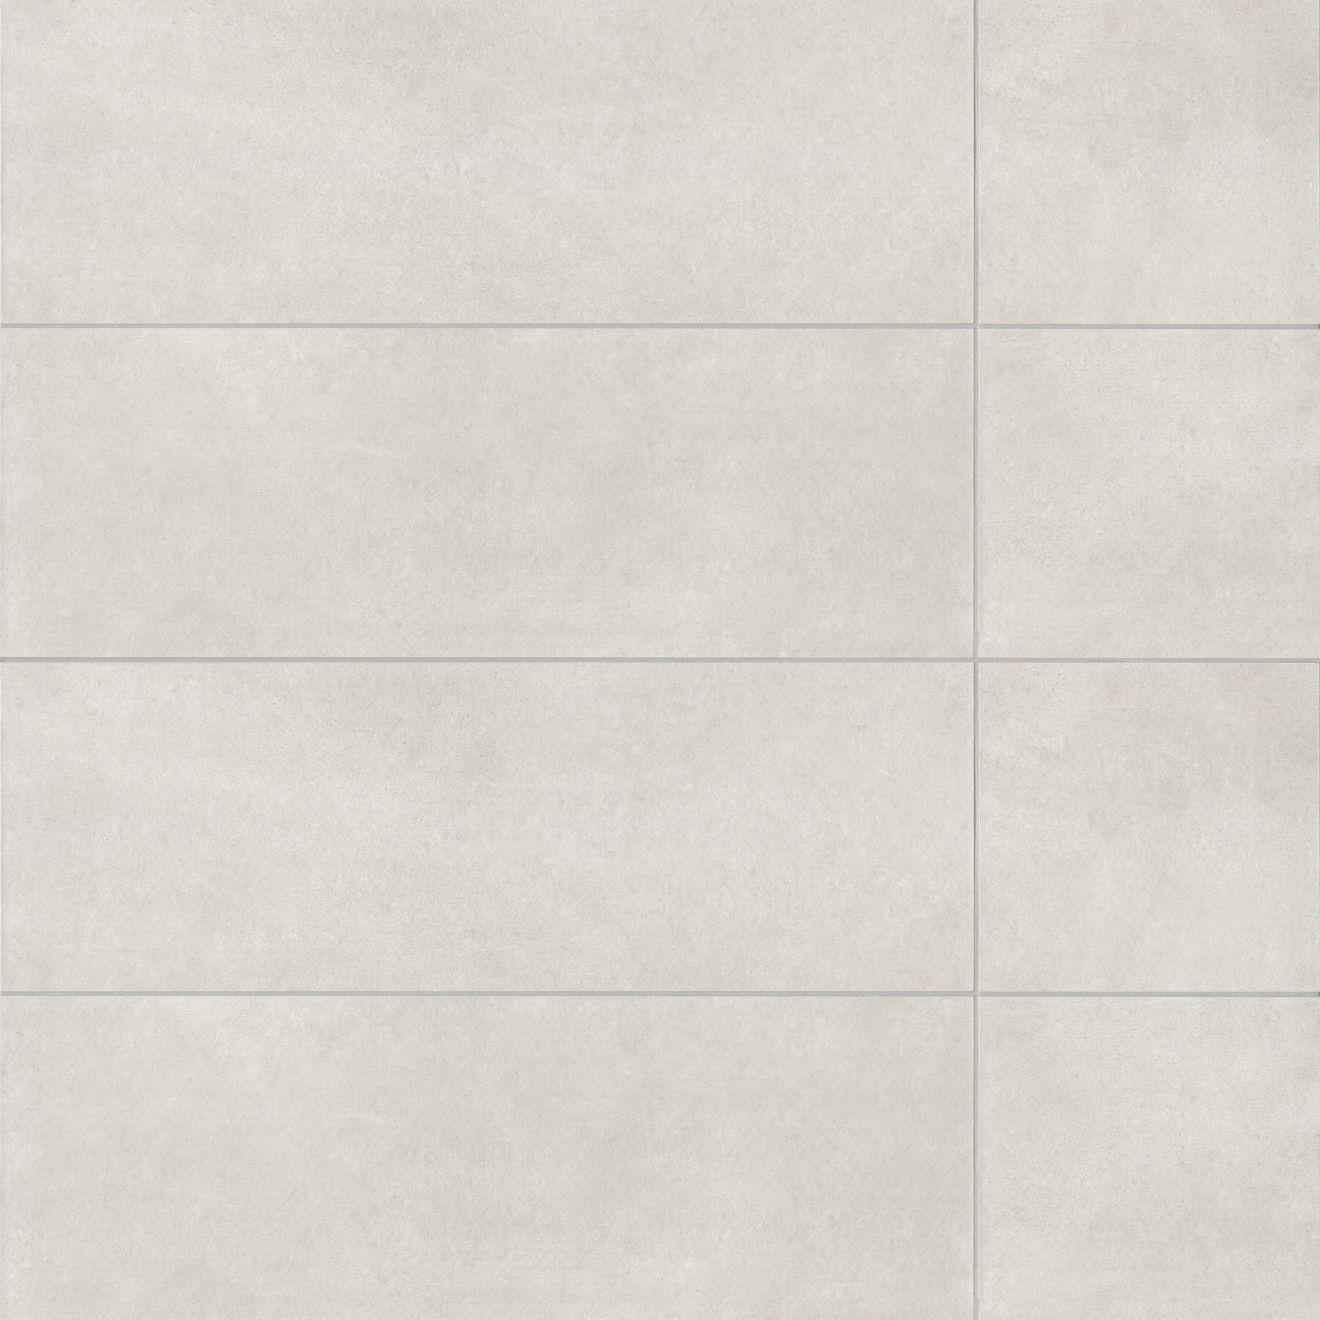 "Calix 12"" x 36"" Matte Ceramic Wall Tile in Grey"